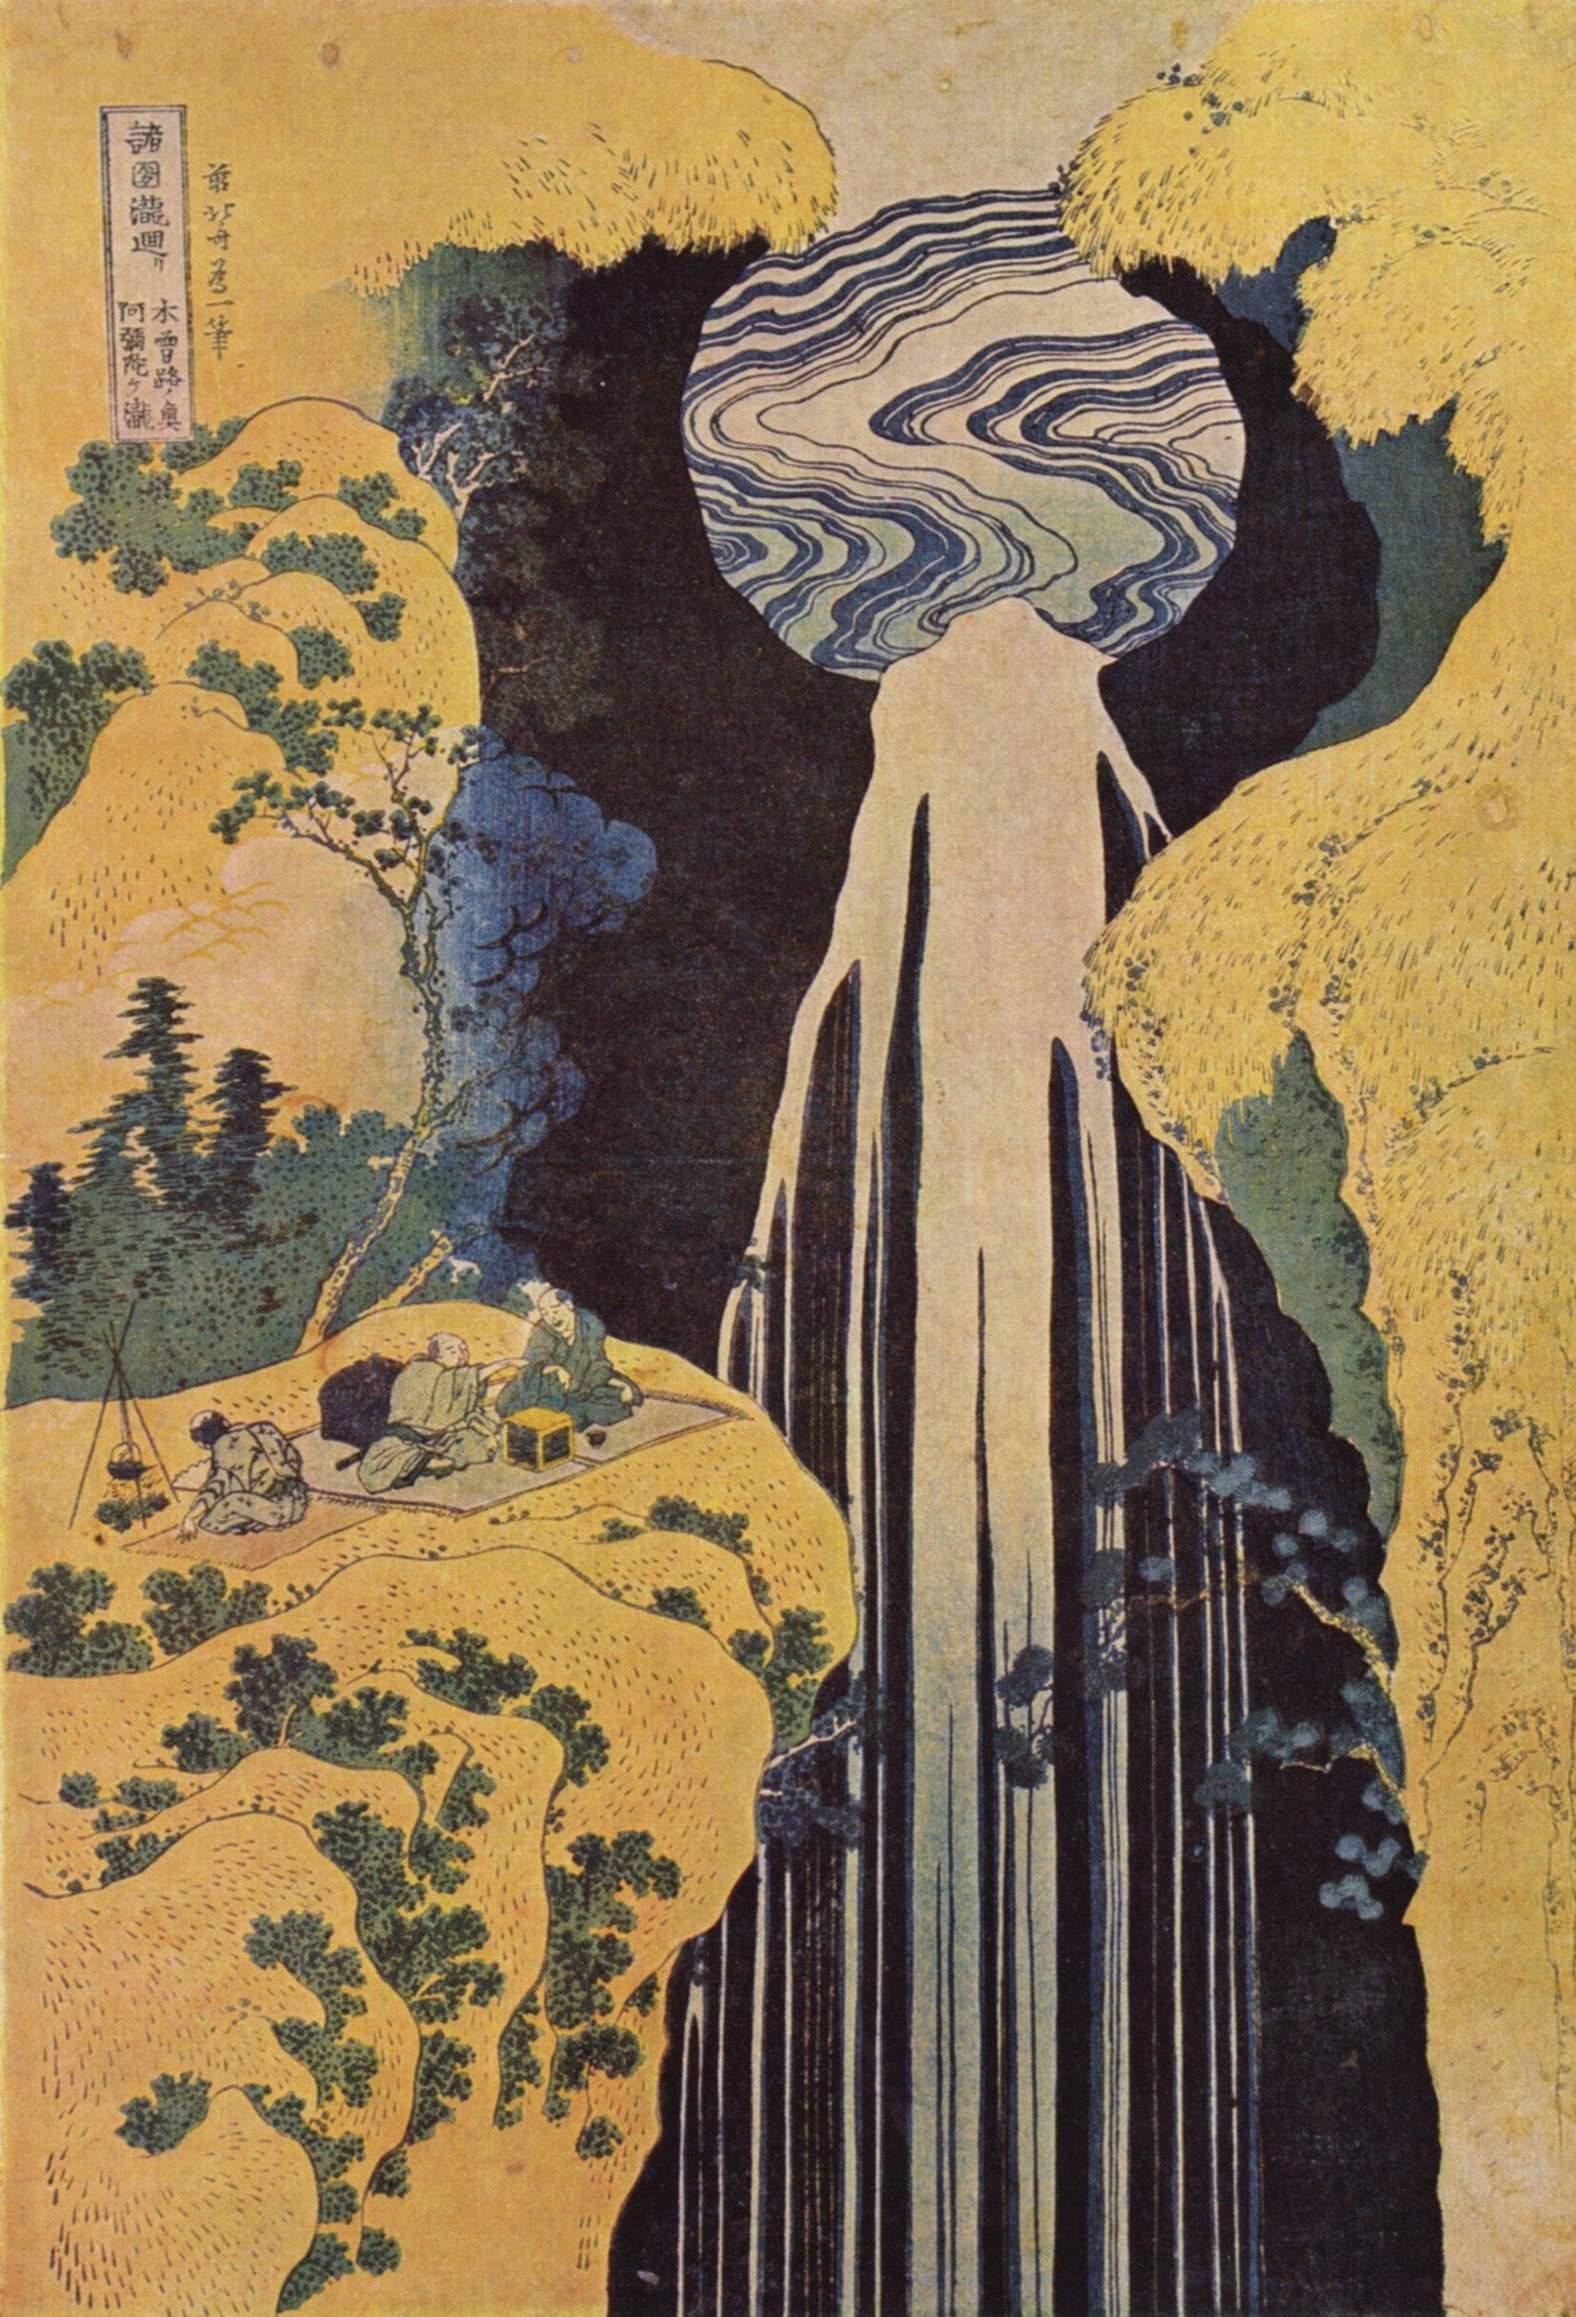 http://upload.wikimedia.org/wikipedia/commons/5/53/Katsushika_Hokusai_001.jpg